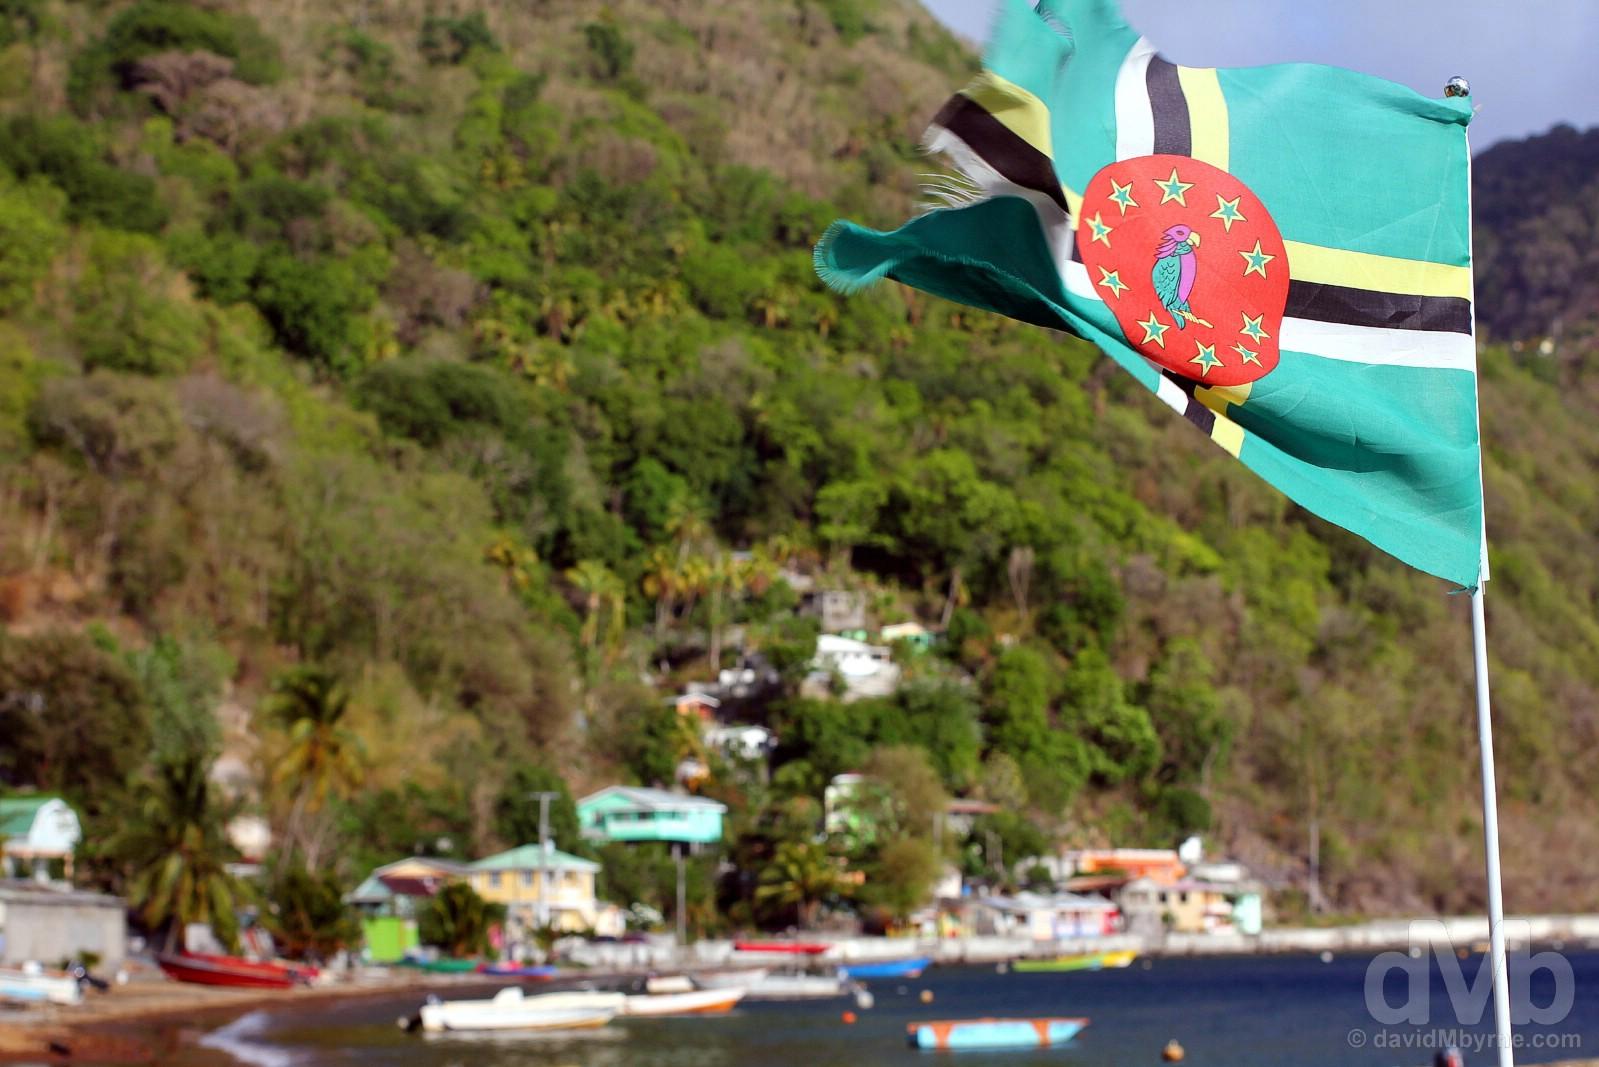 Bubble Beach, Soufriere, southern Dominica. June 11, 2015.